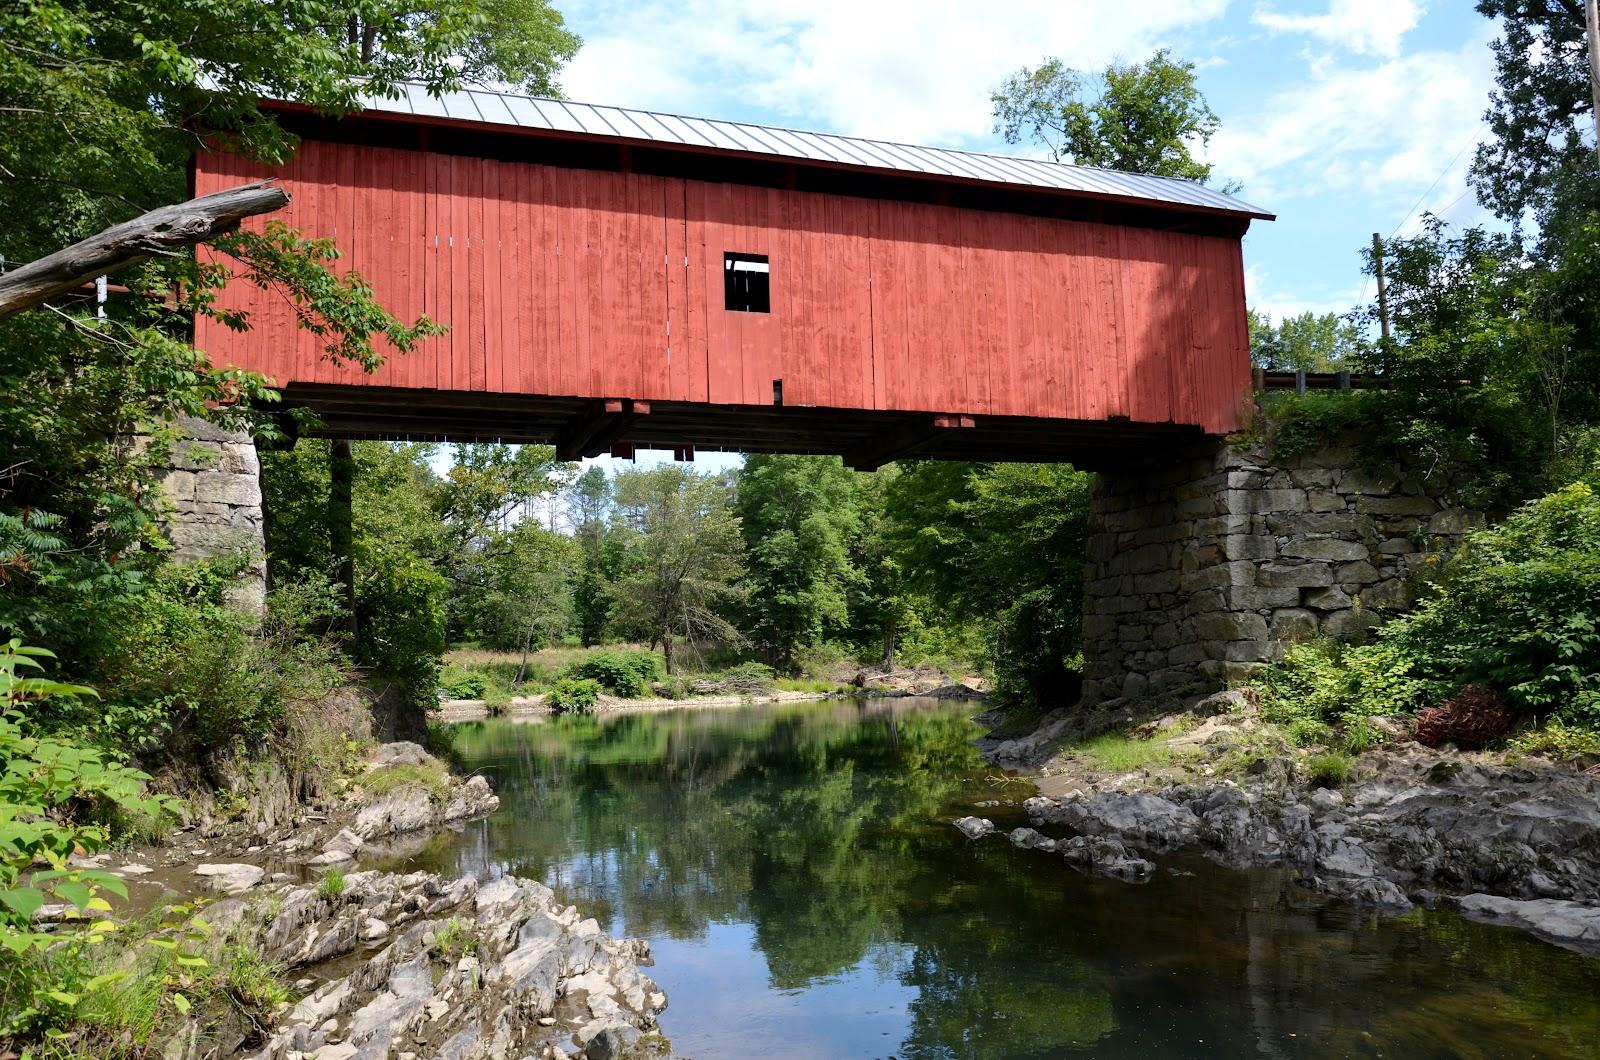 Baugh's Blog: Photo Essay: Covered Bridges in Vermont - photo#36